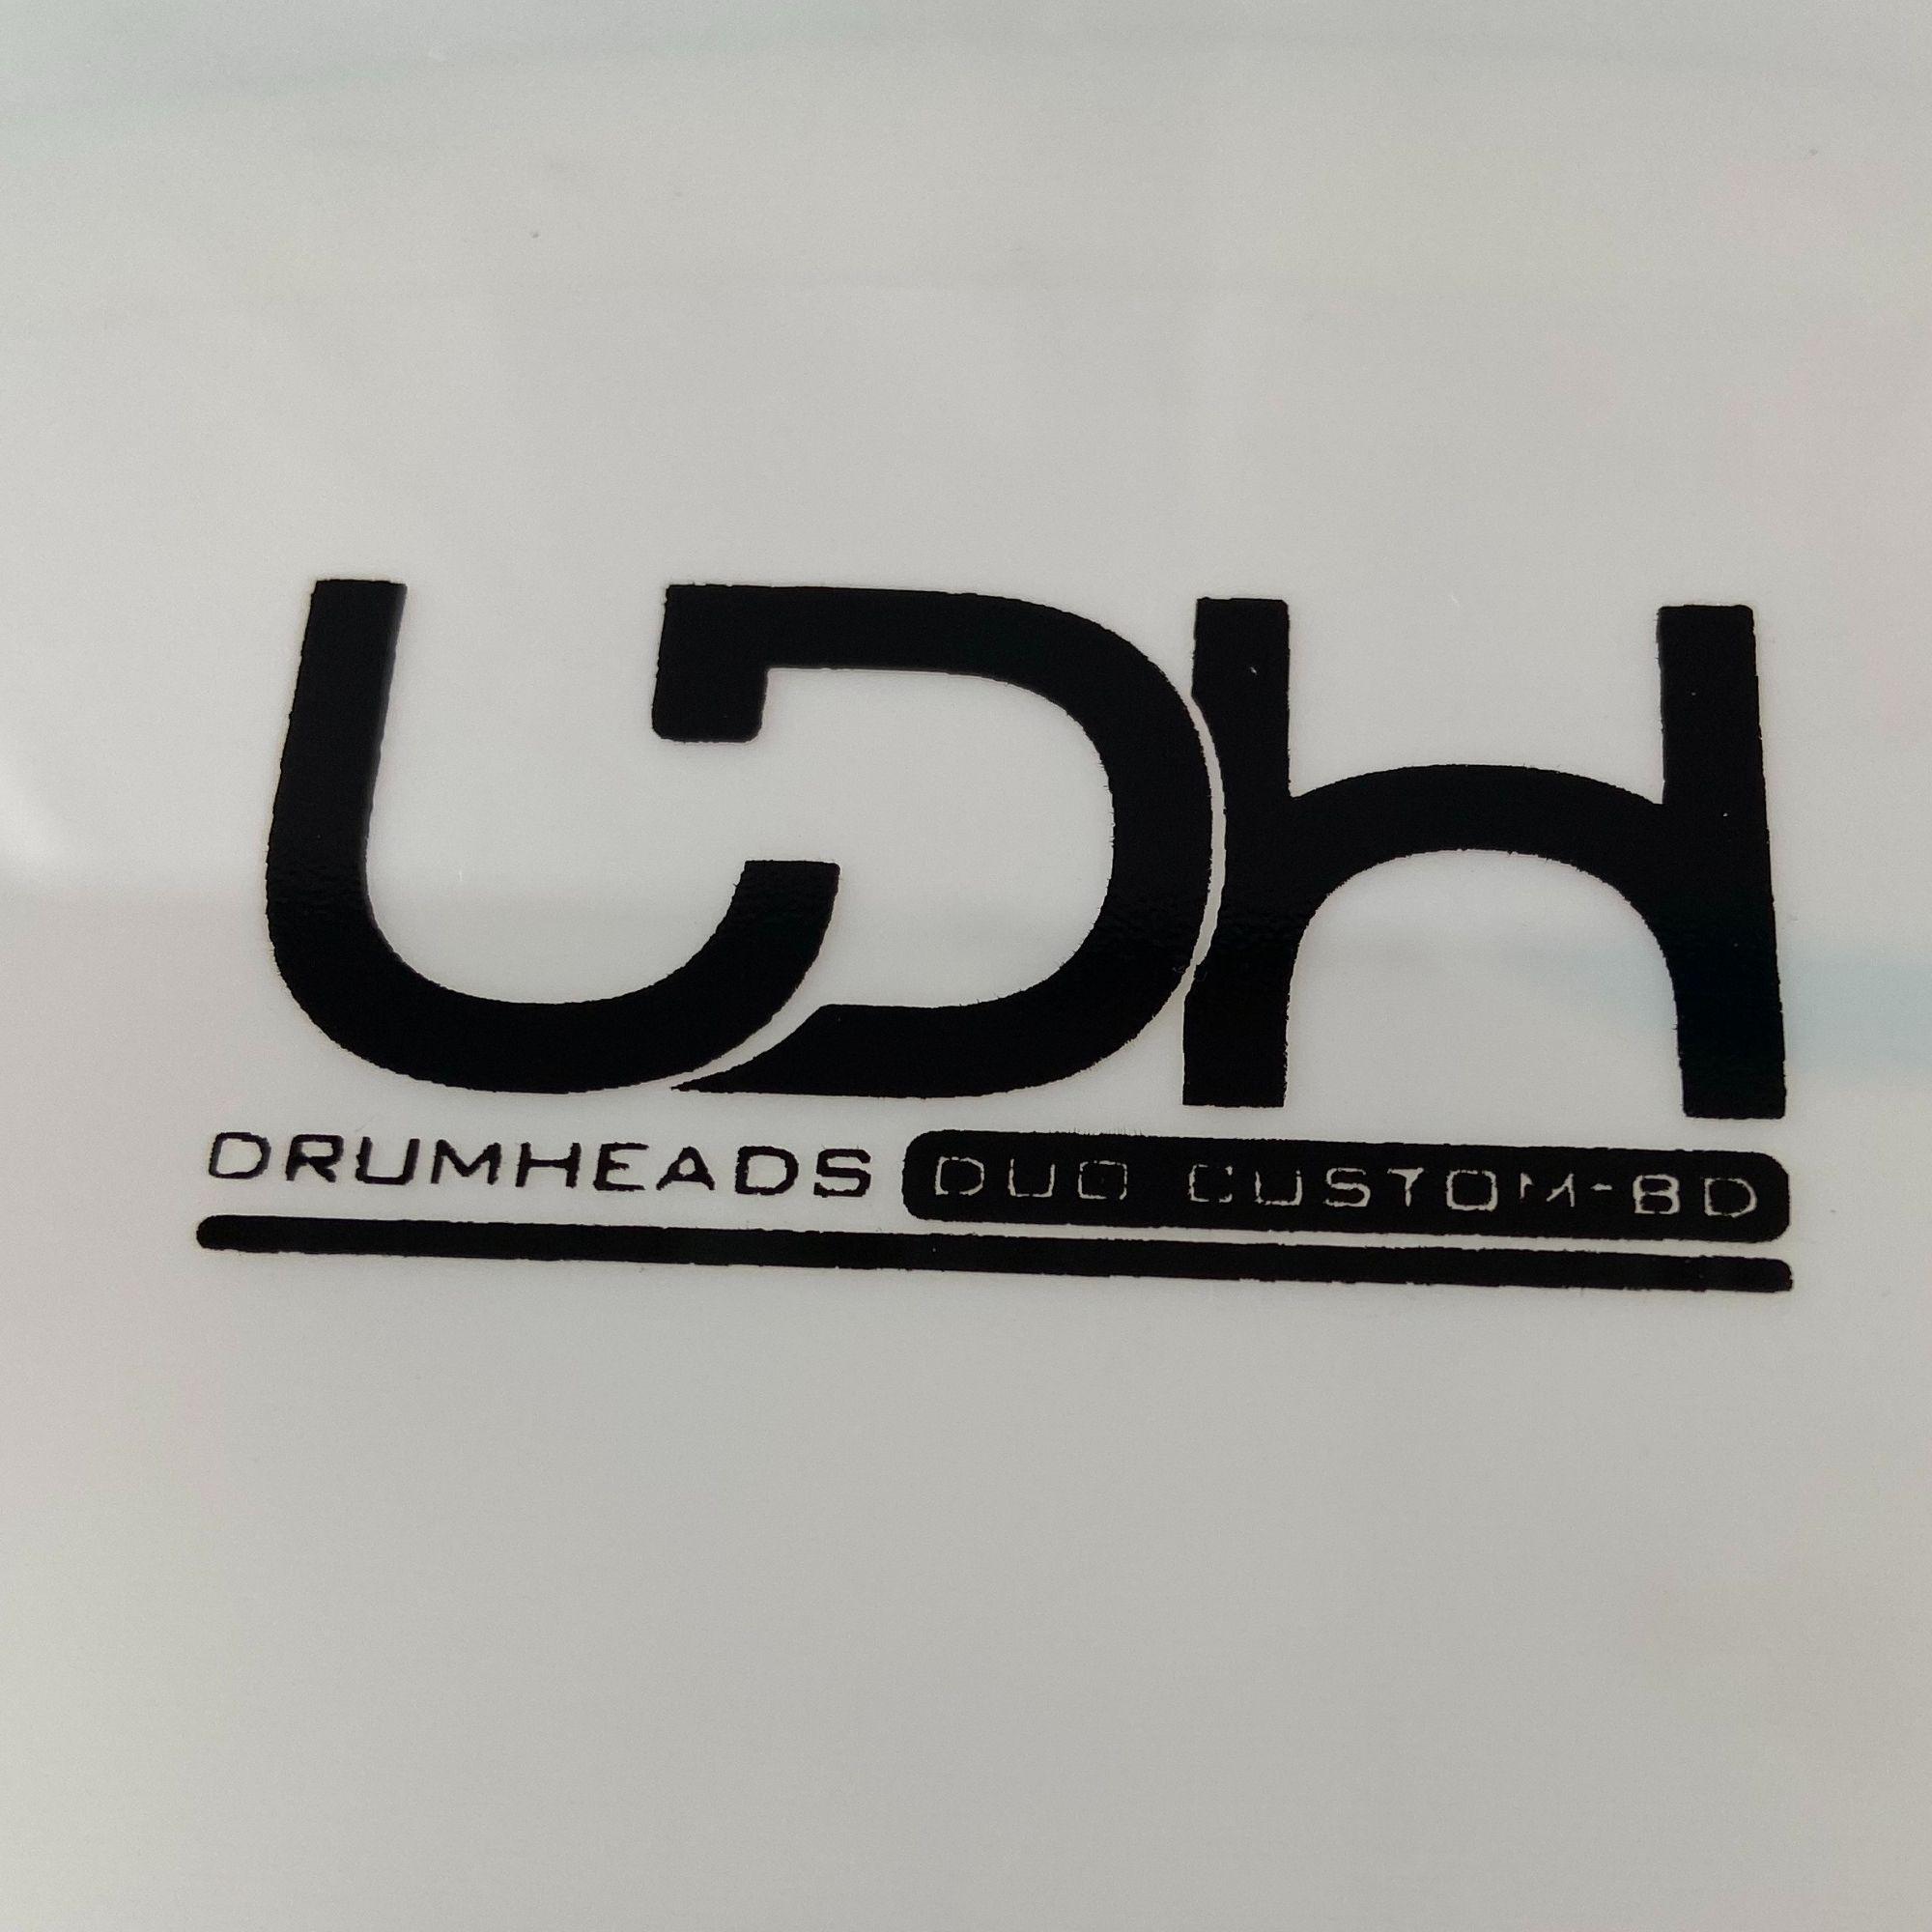 "Pele Batedeira Duo Custom BD Luen Drumheads LDH 18"" para Bumbo de Bateria."